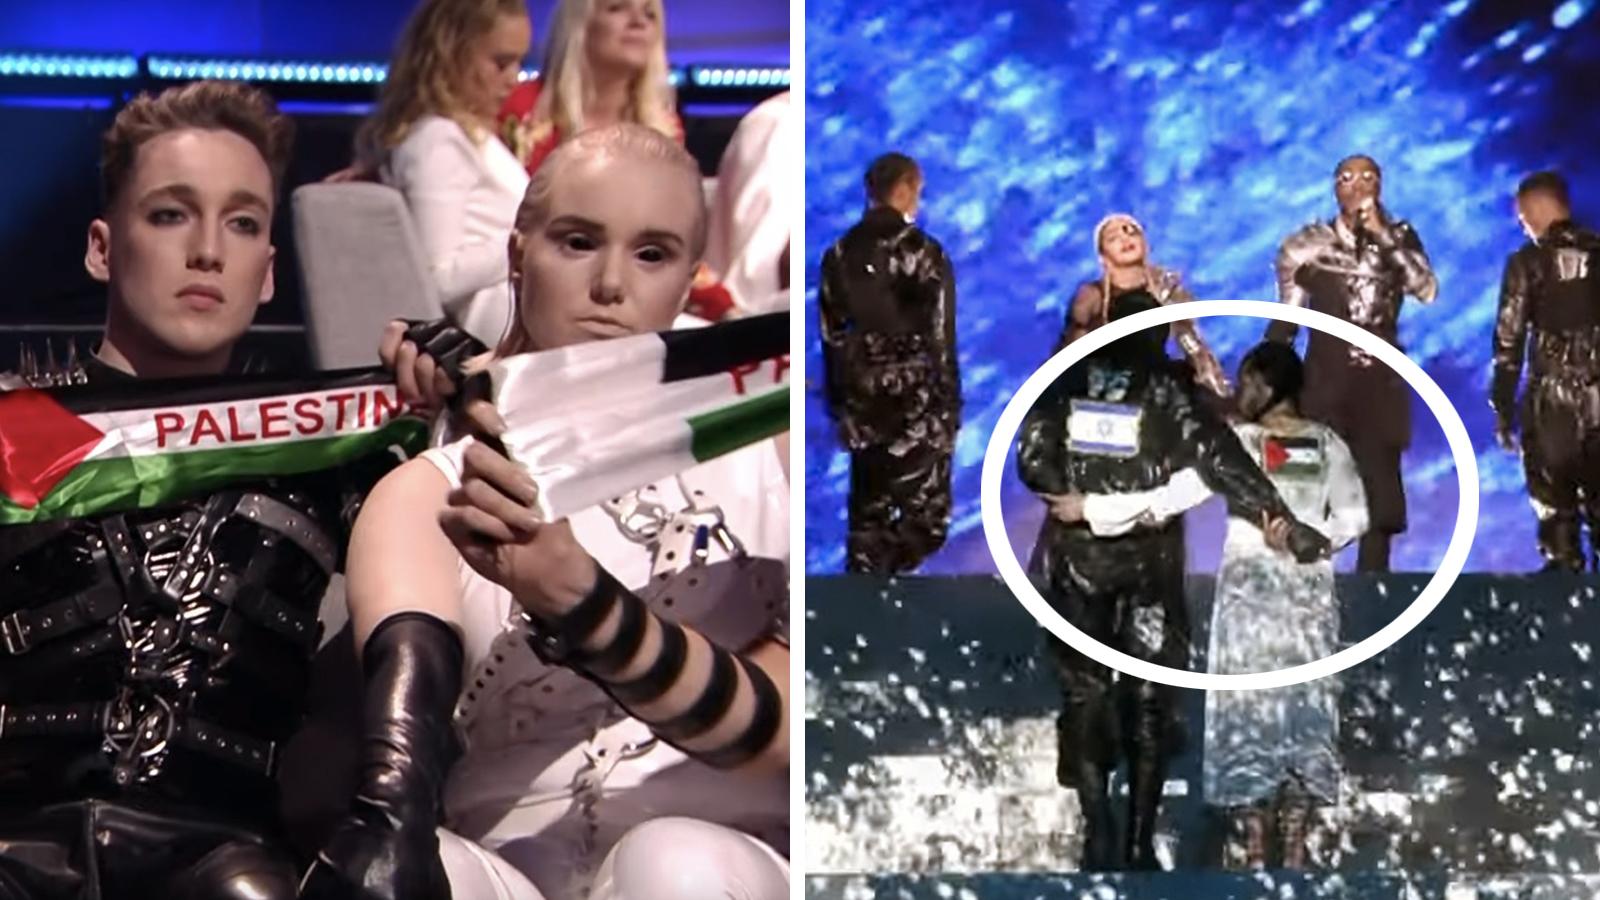 Palæstina-manifestation i Eurovision-finalen